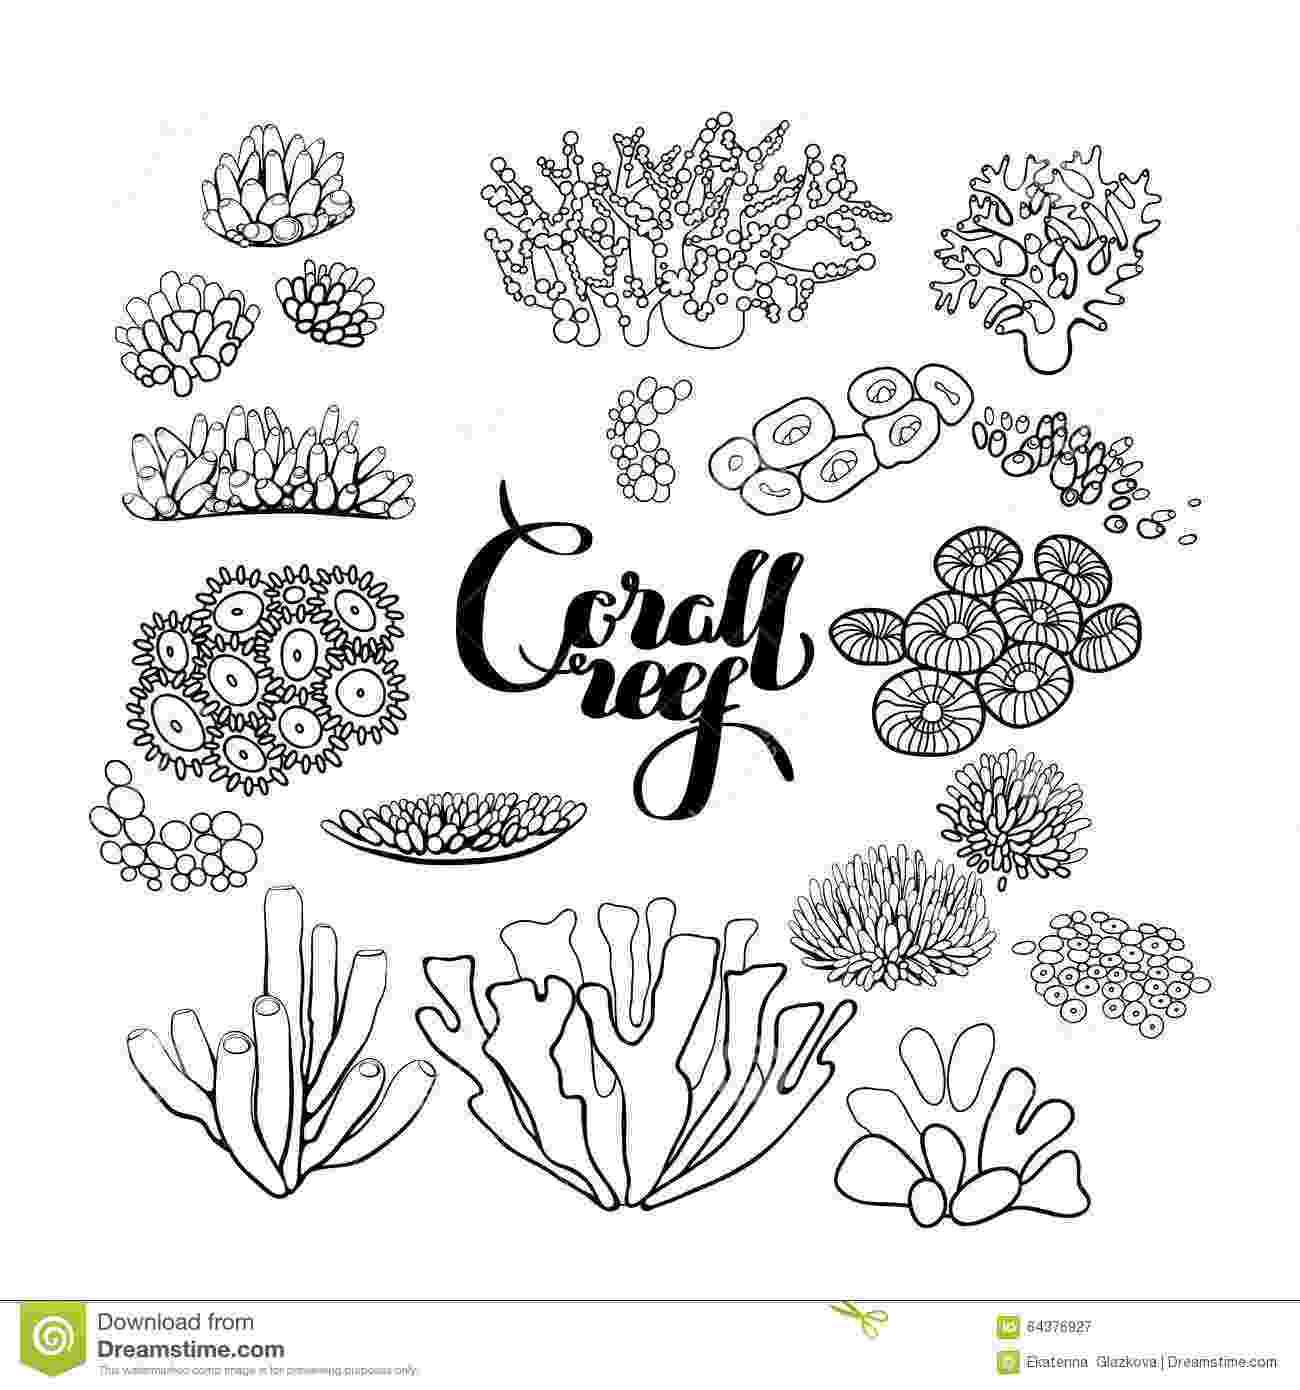 ocean plants coloring pages seaweed coloring pages getcoloringpagescom coloring ocean plants pages